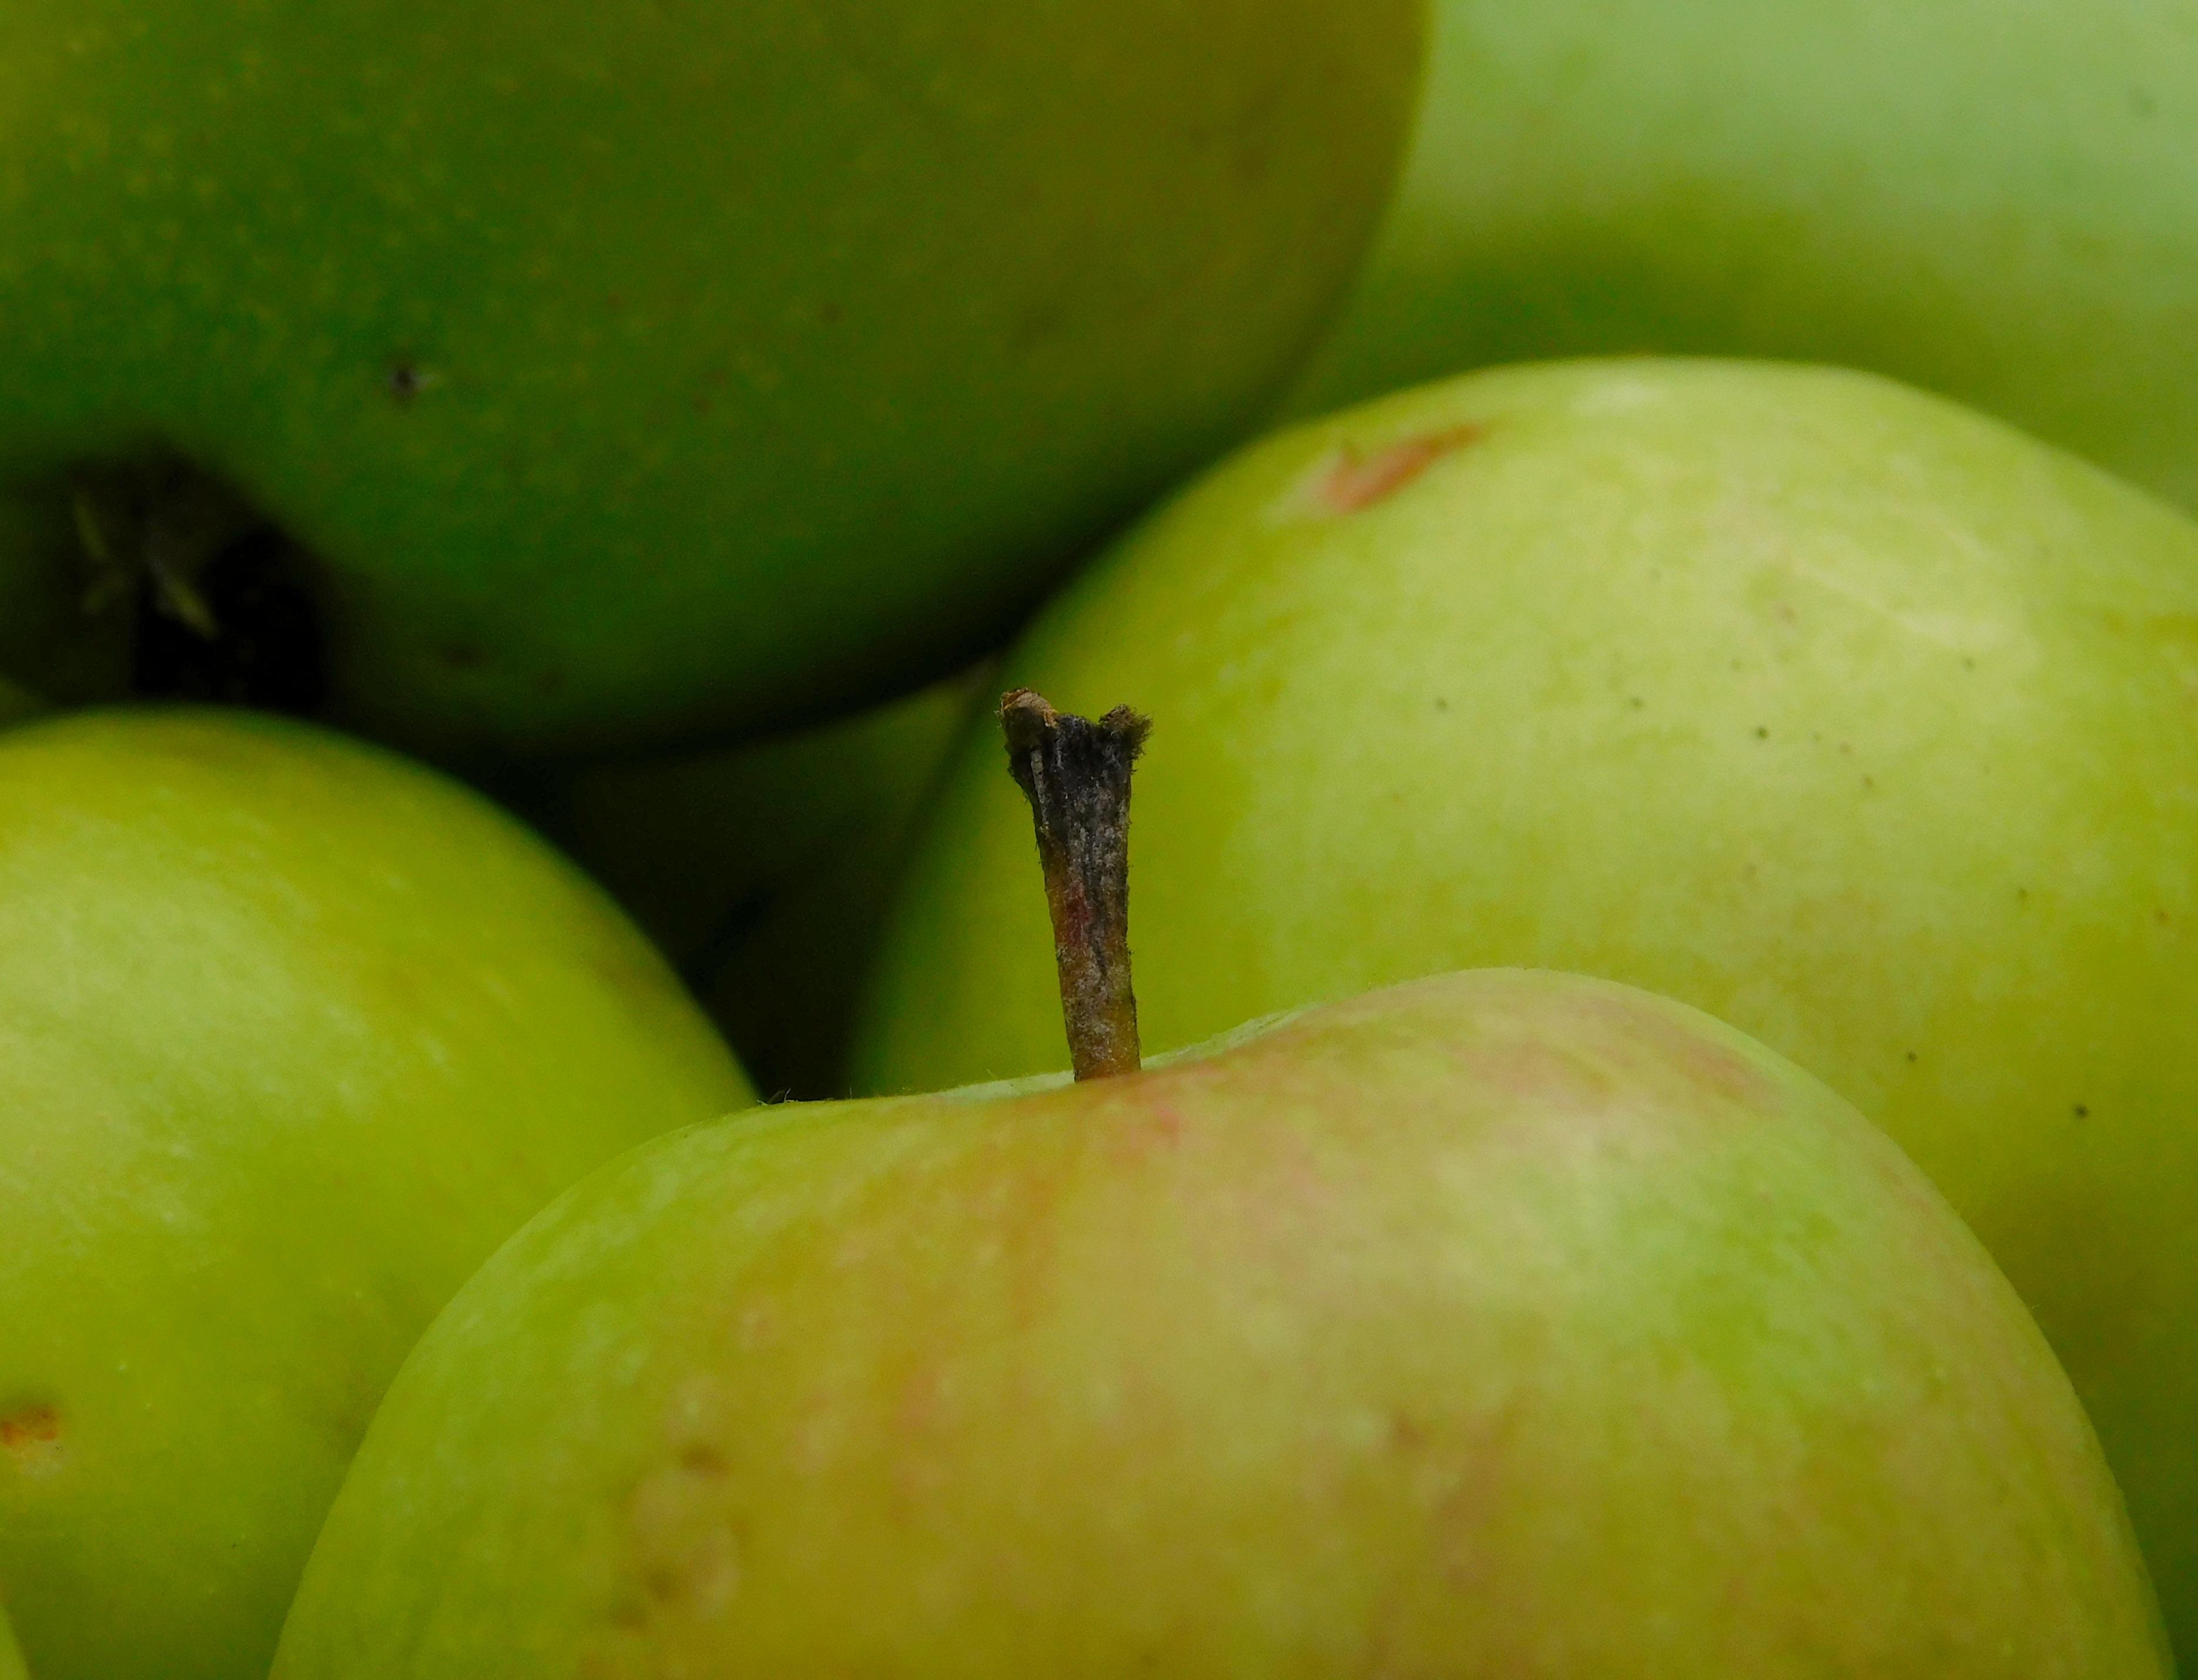 Кислые яблоки картинки